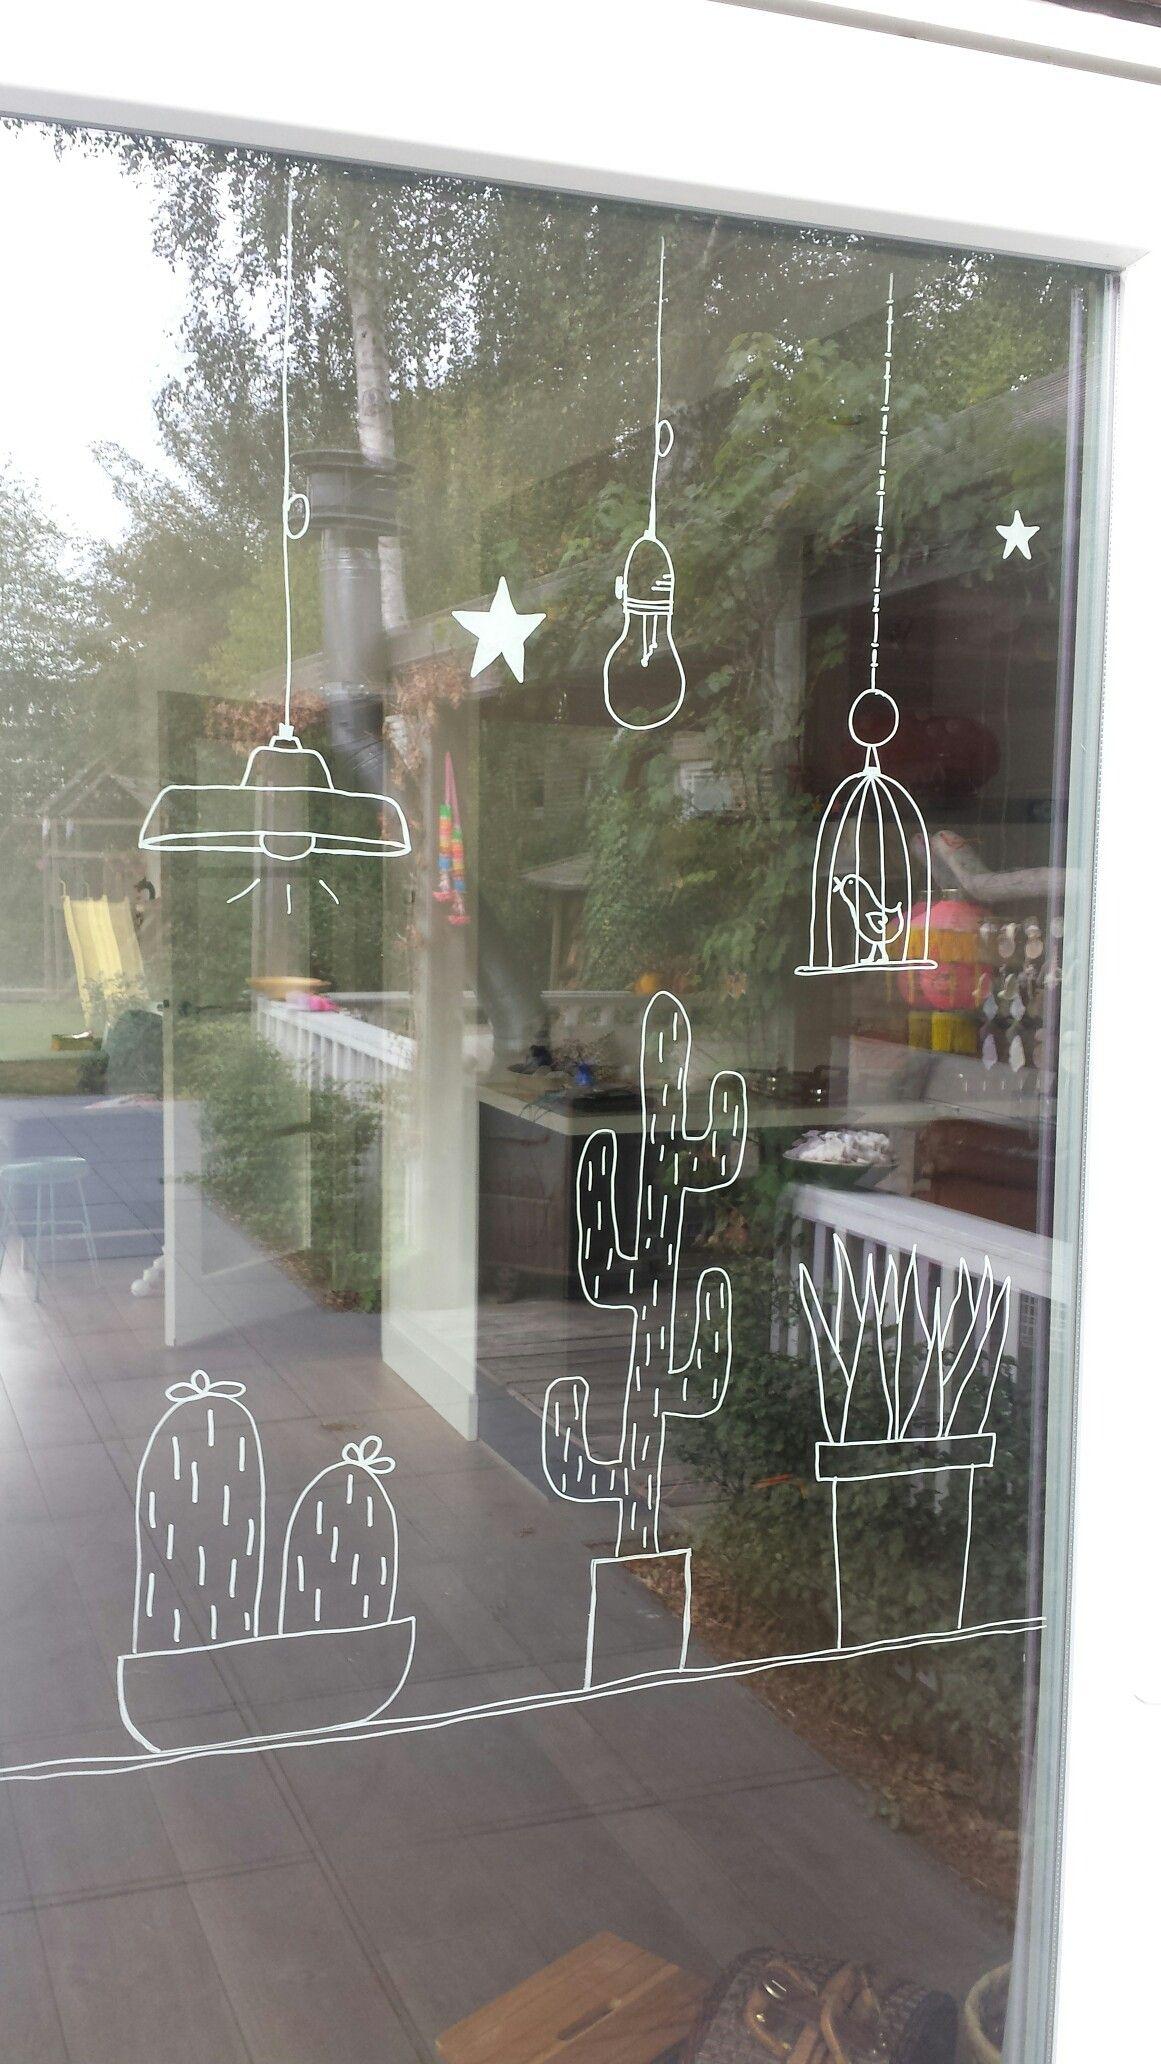 Epingle Par Joyce Hofland Sur Raamtekening Pinterest Deco